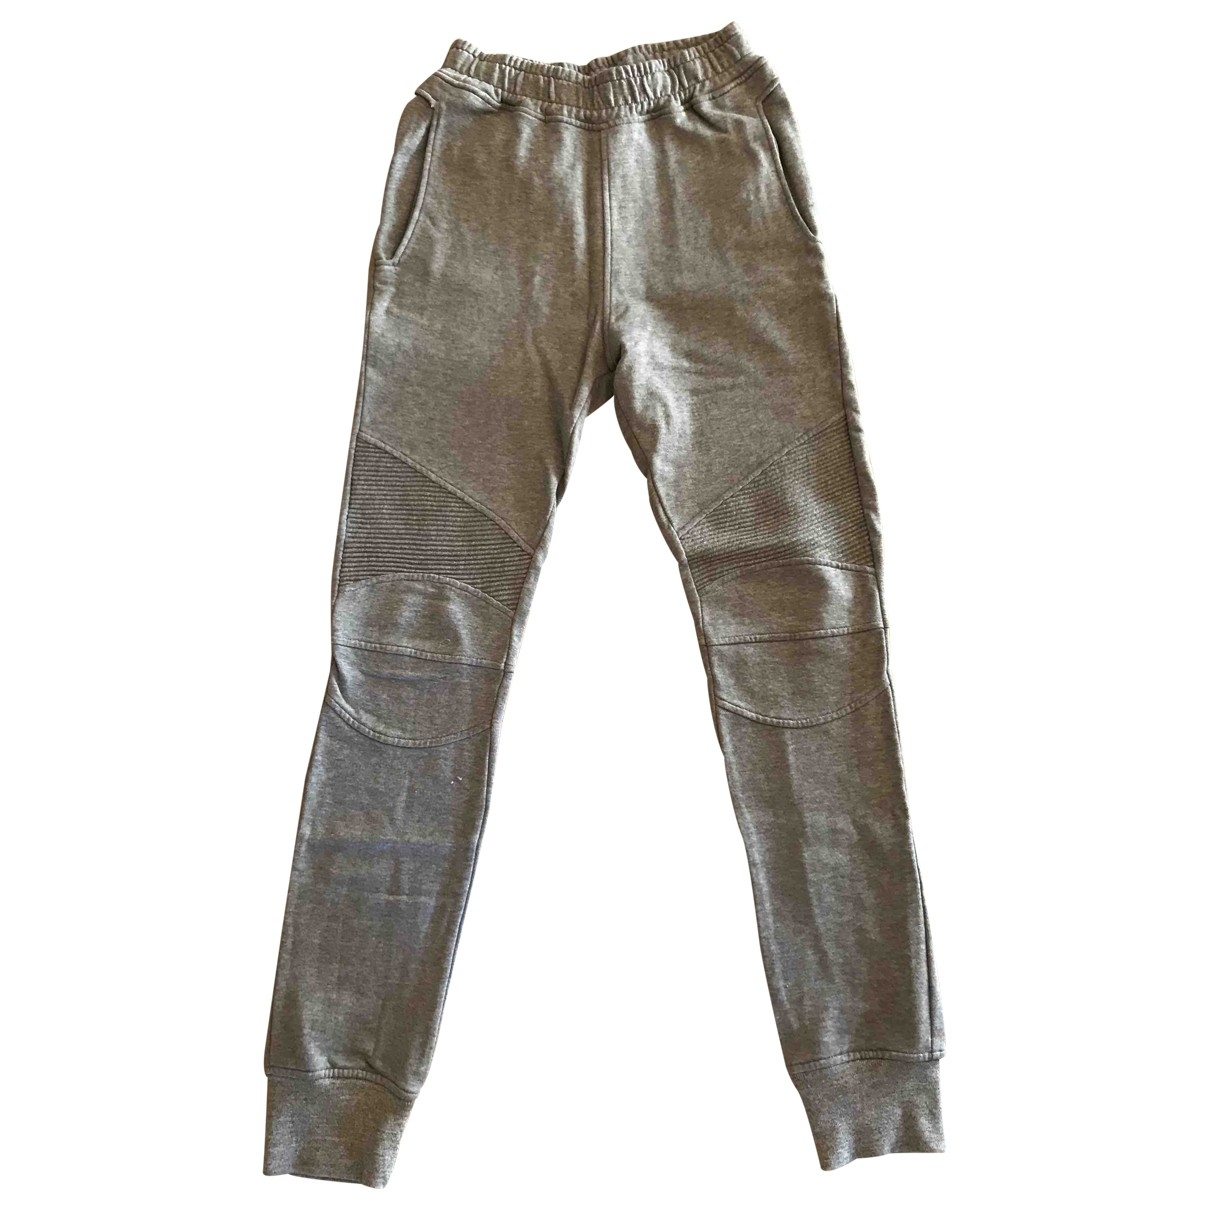 Balmain \N Grey Cotton Trousers for Men M International